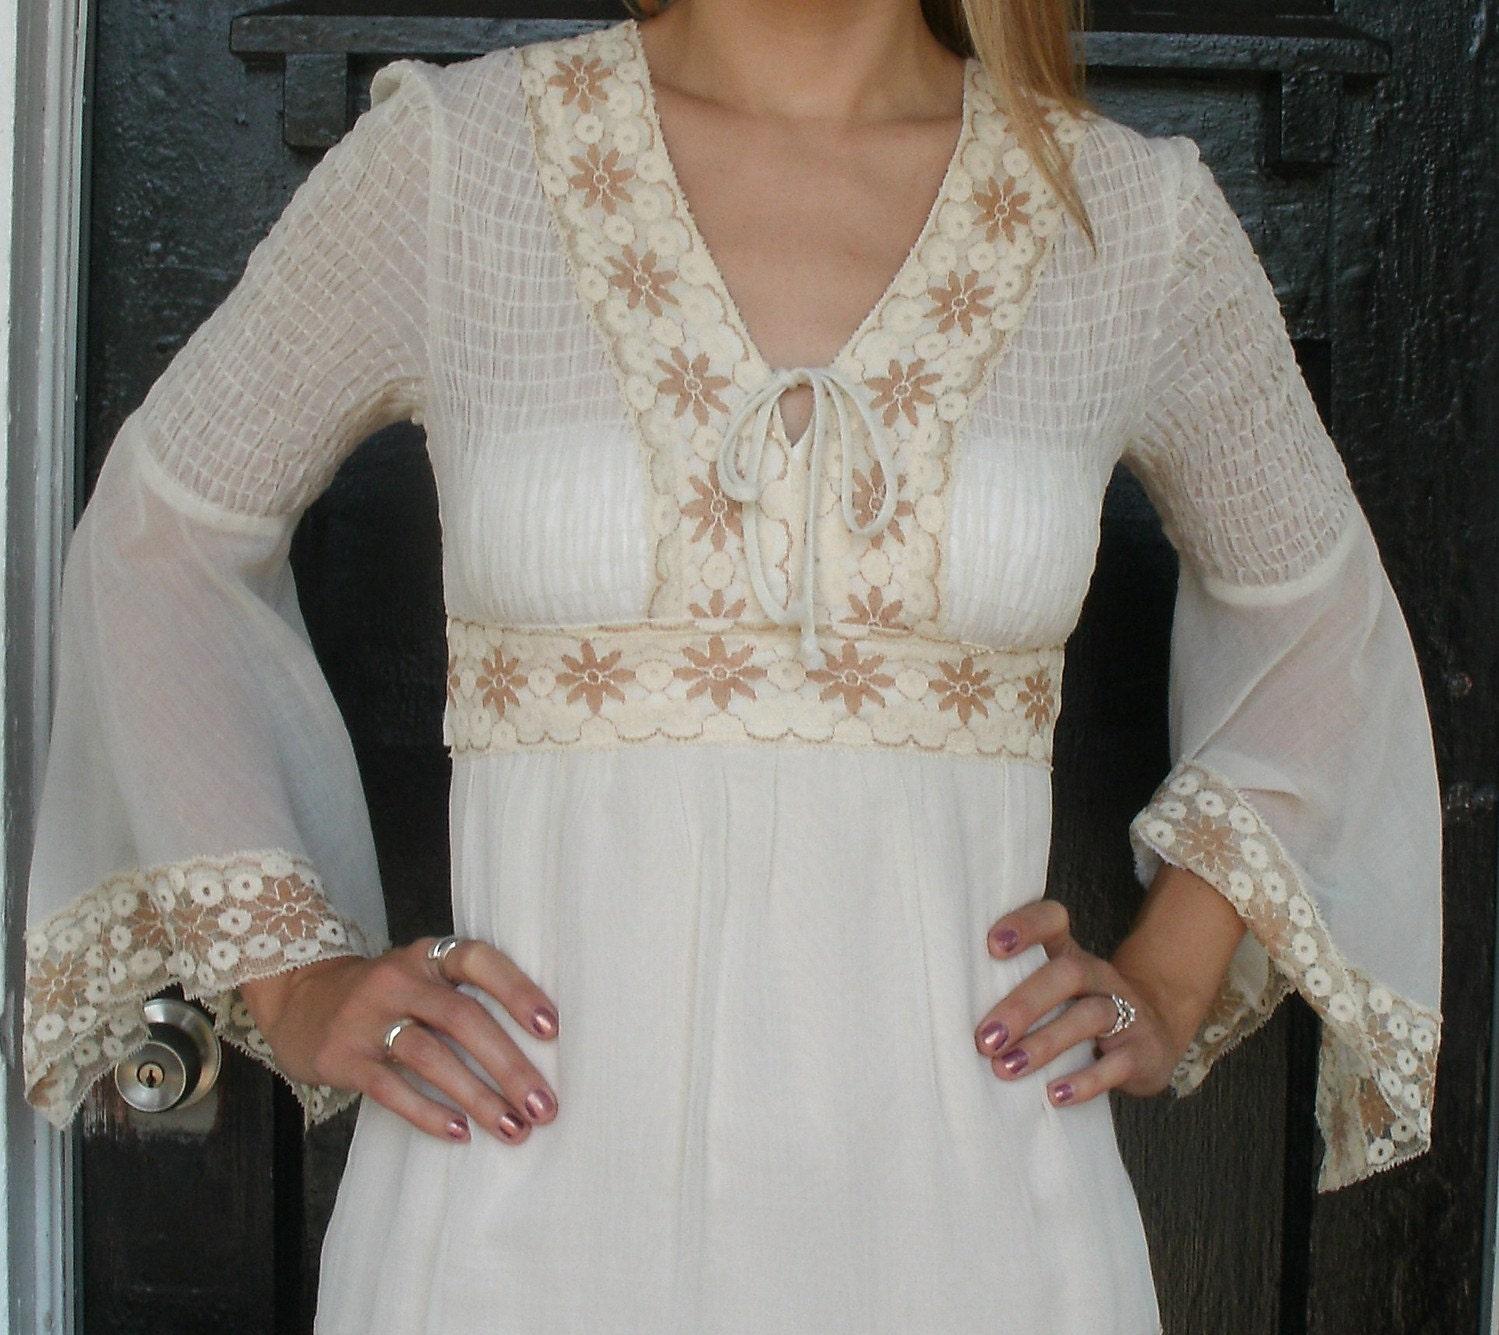 Vintage Wedding Dresses With Bell Sleeves: Vintage 1970s Boho Ethereal Bell Sleeve Wedding Dress